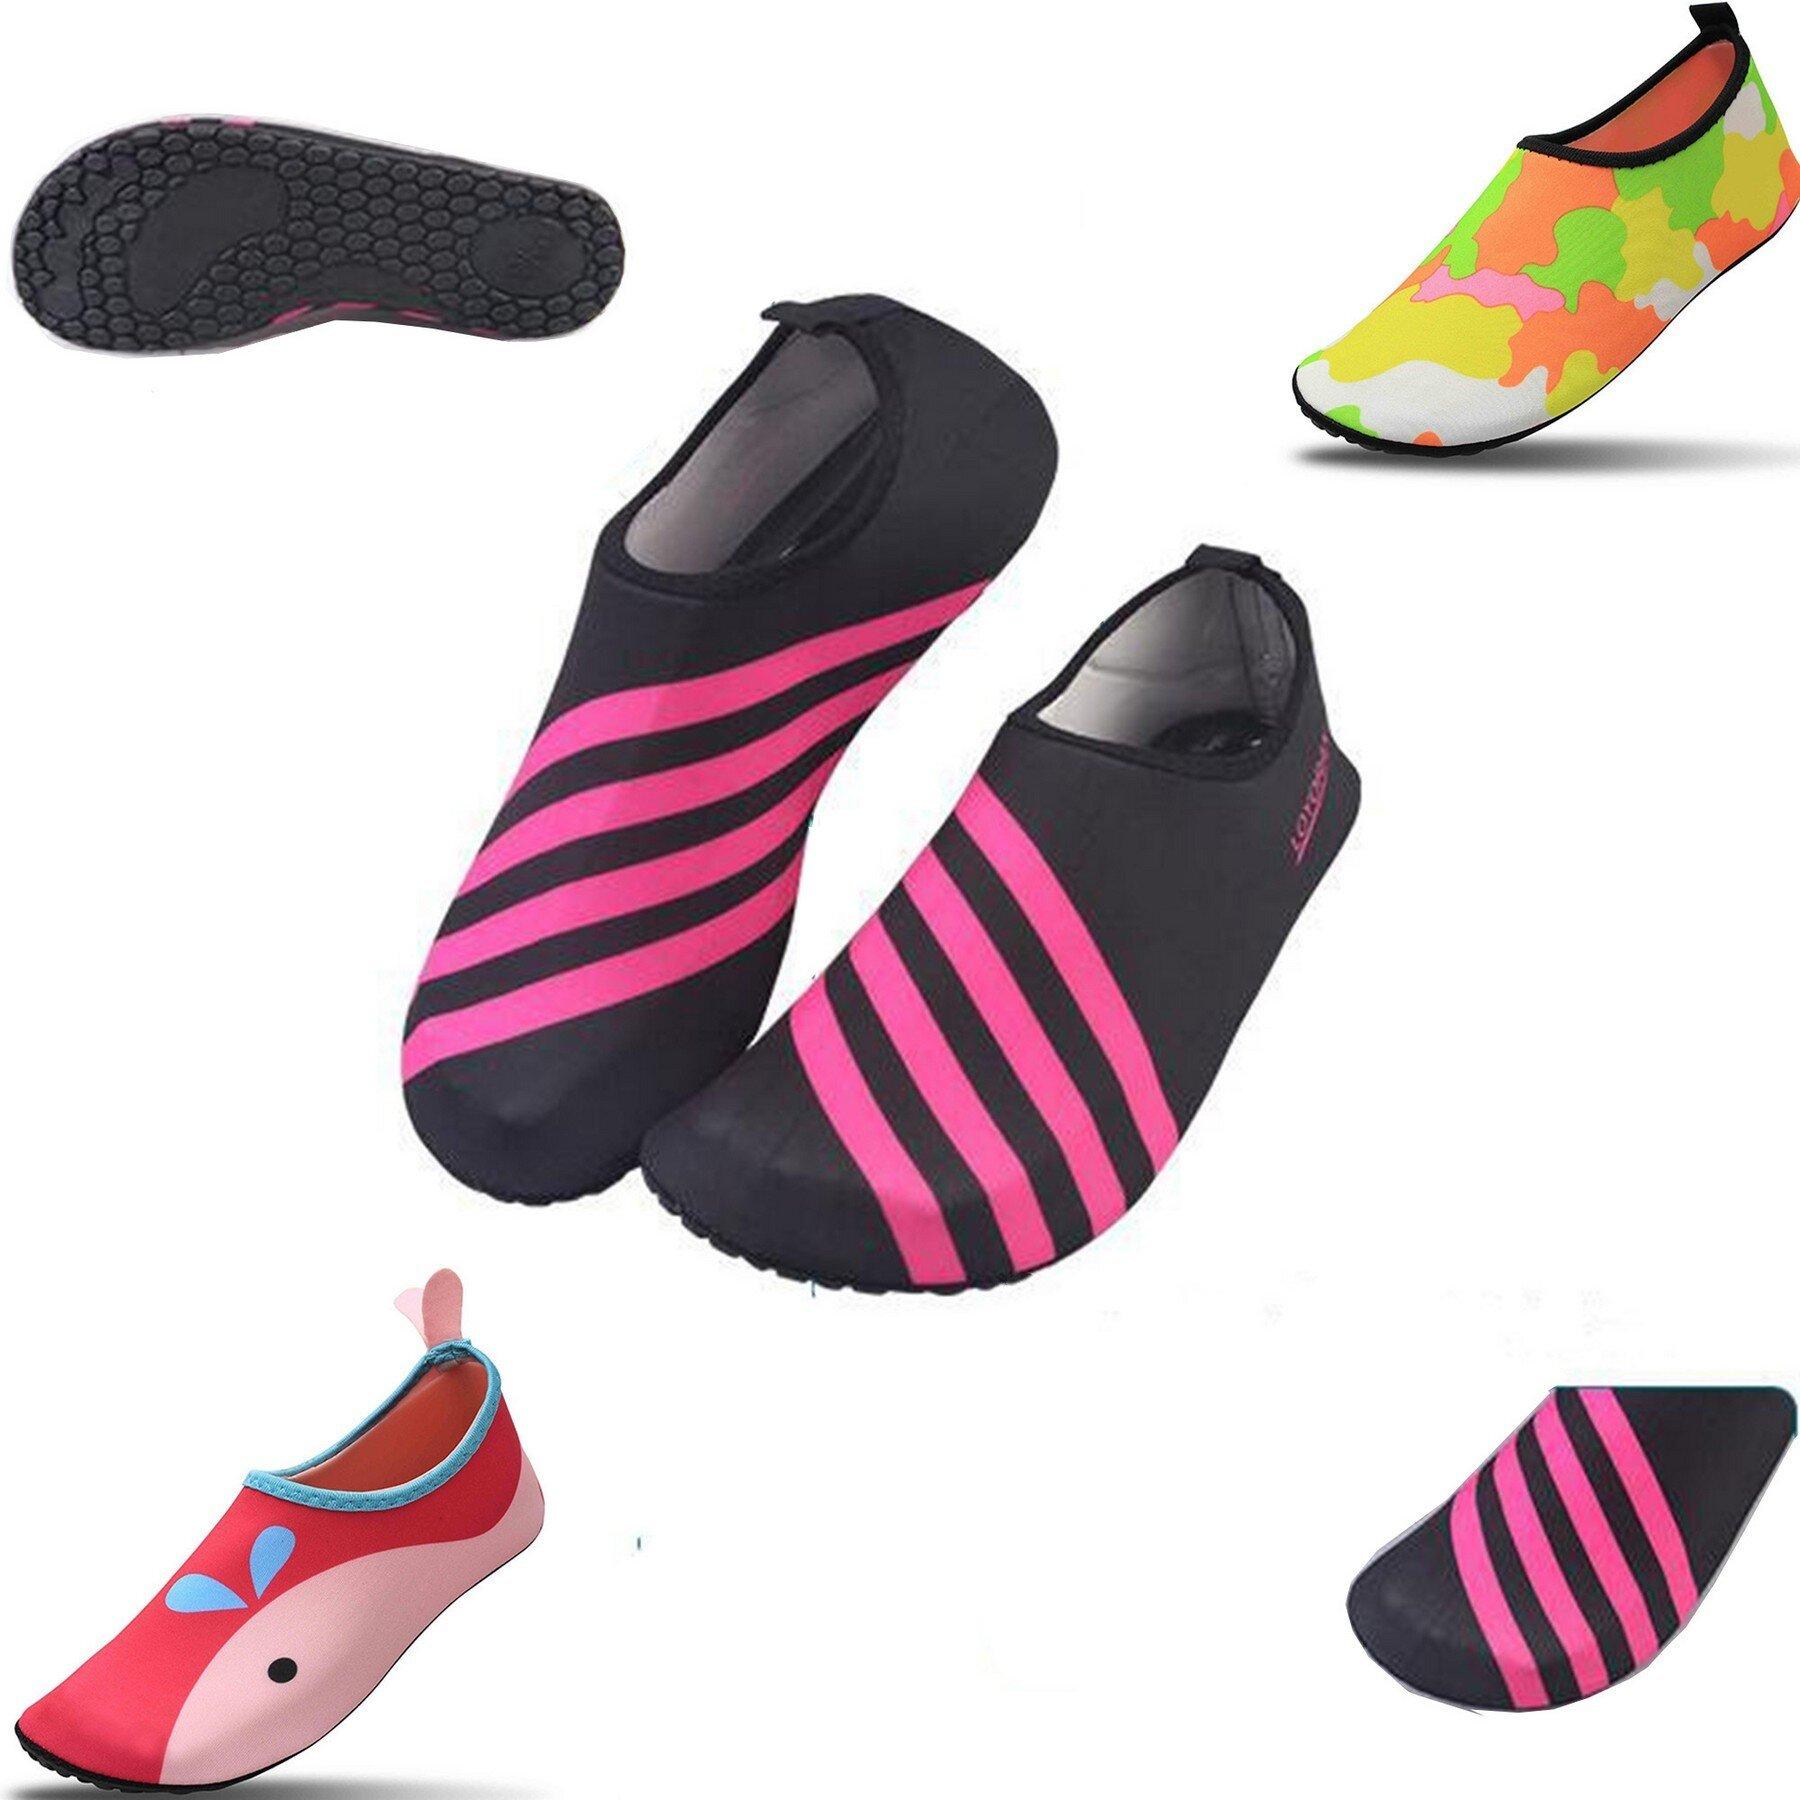 soft shoe socks.jpg